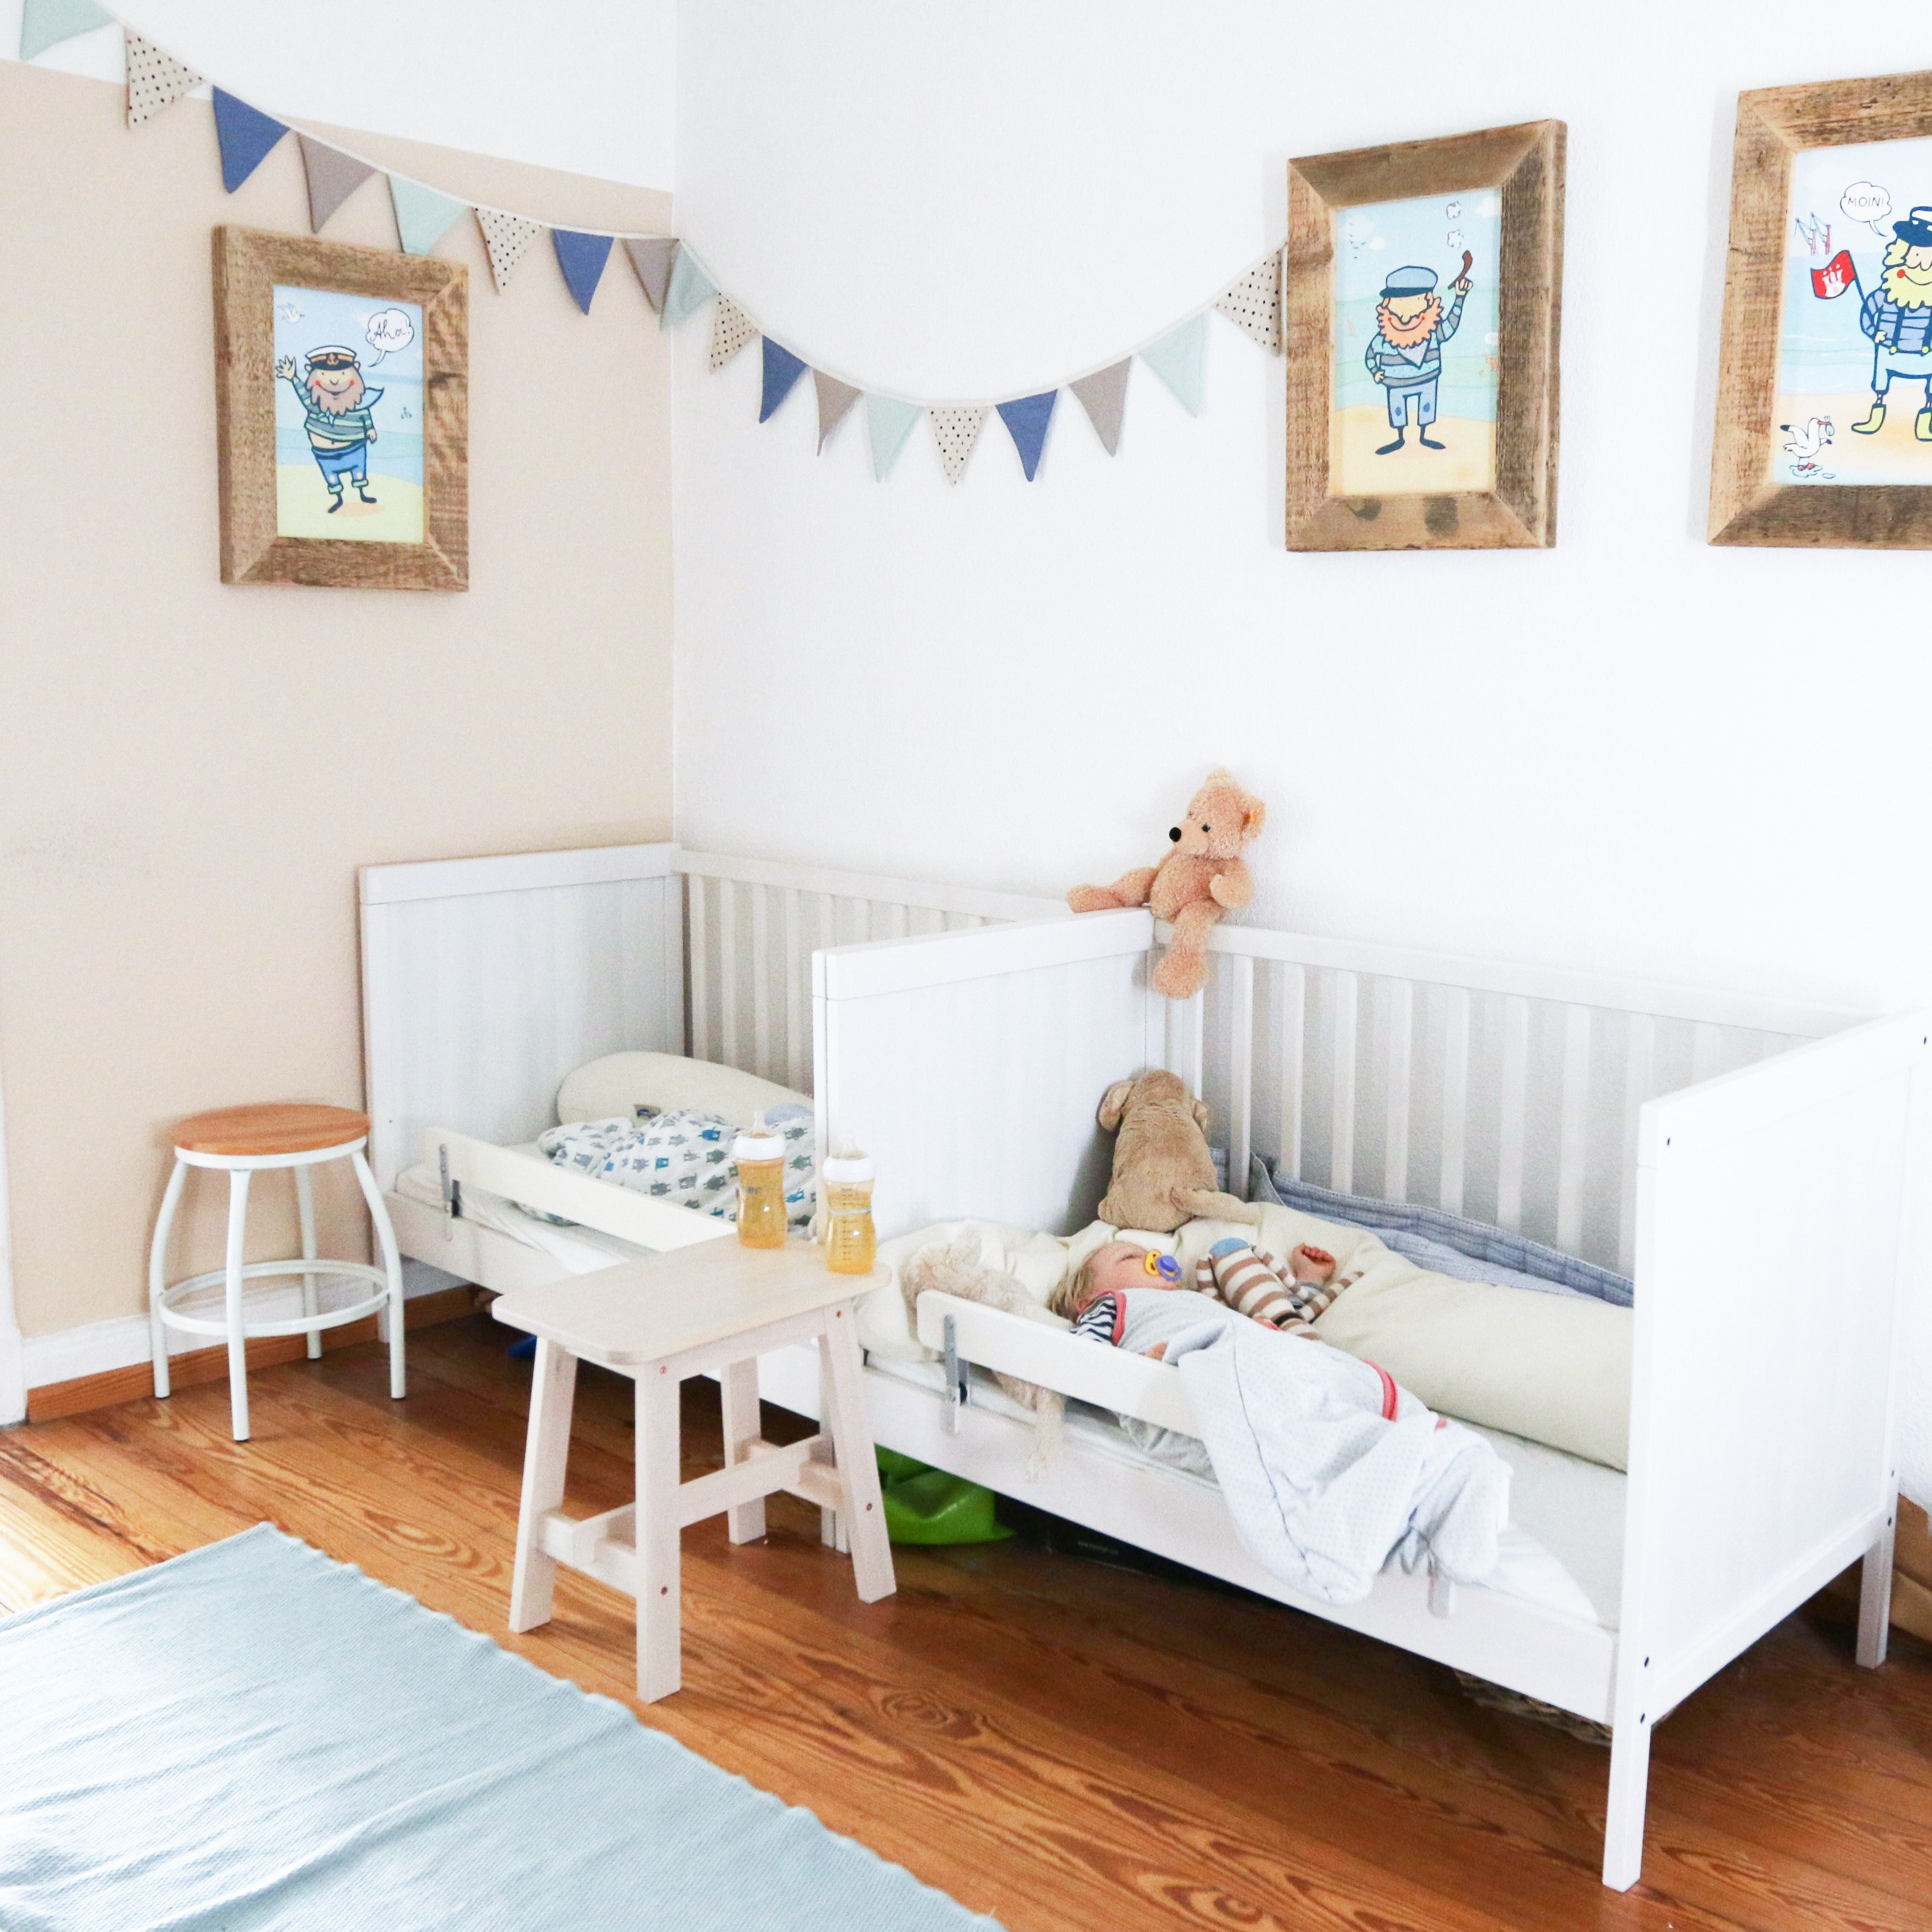 Kinderzimmer, Betten, Zwillingsbetten, zwillingszimmer | Interior ...